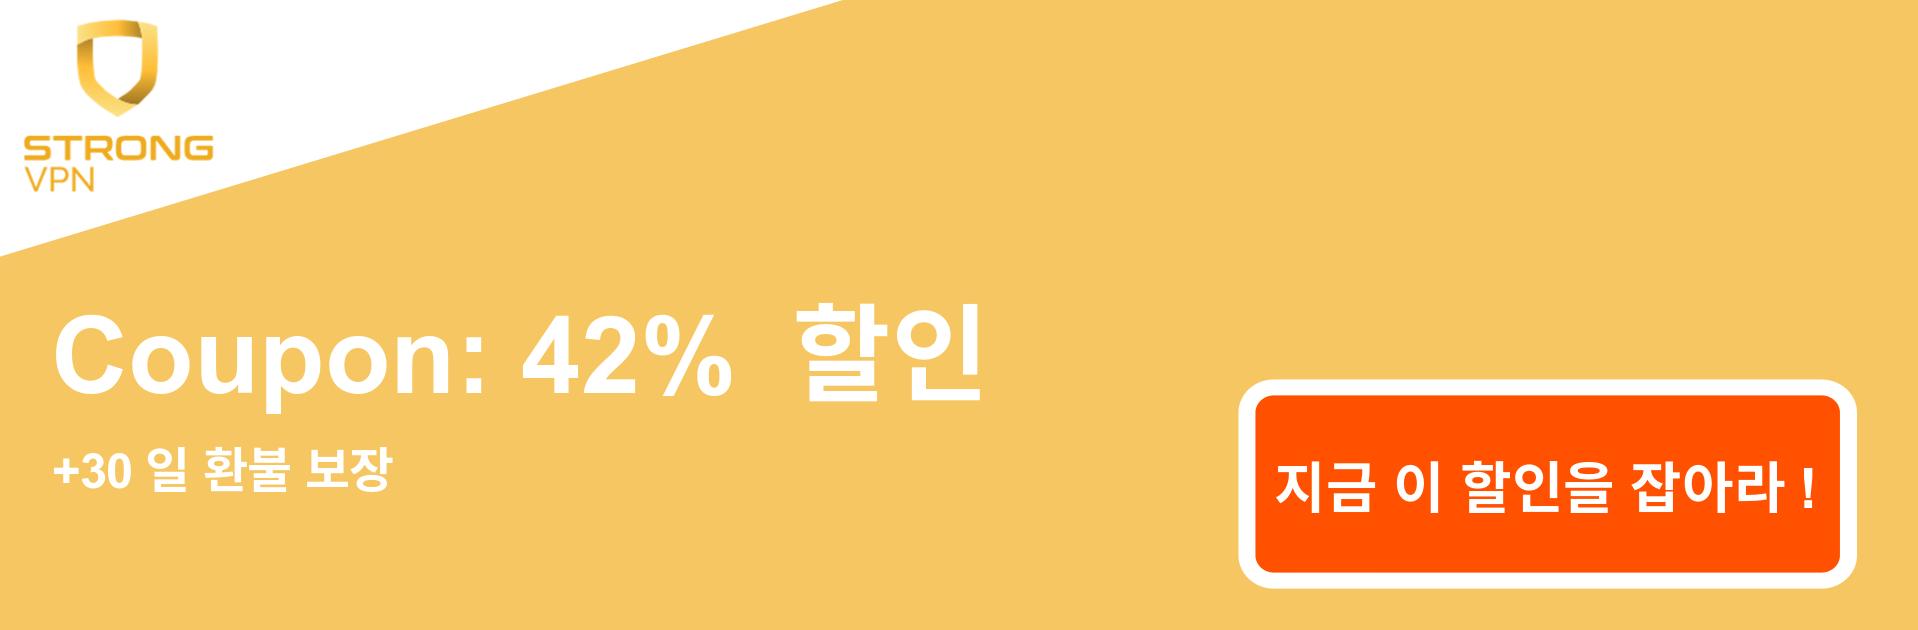 StrongVPN 쿠폰 배너-42 % 할인